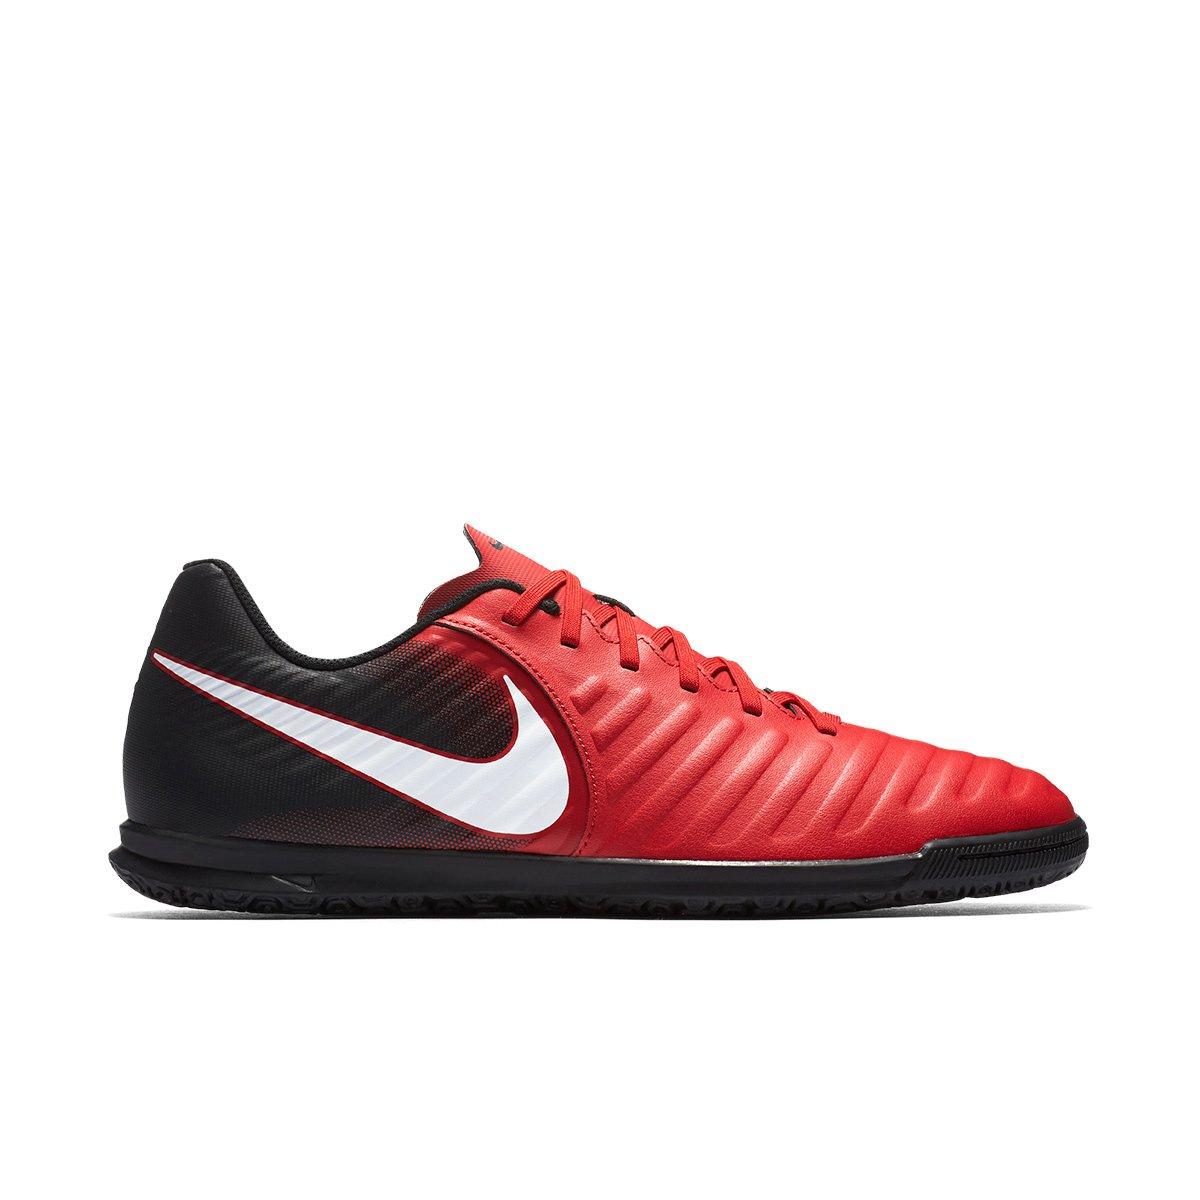 282be55a9bffc Chuteira Futsal Nike Tiempo Rio 4 IC - Compre Agora